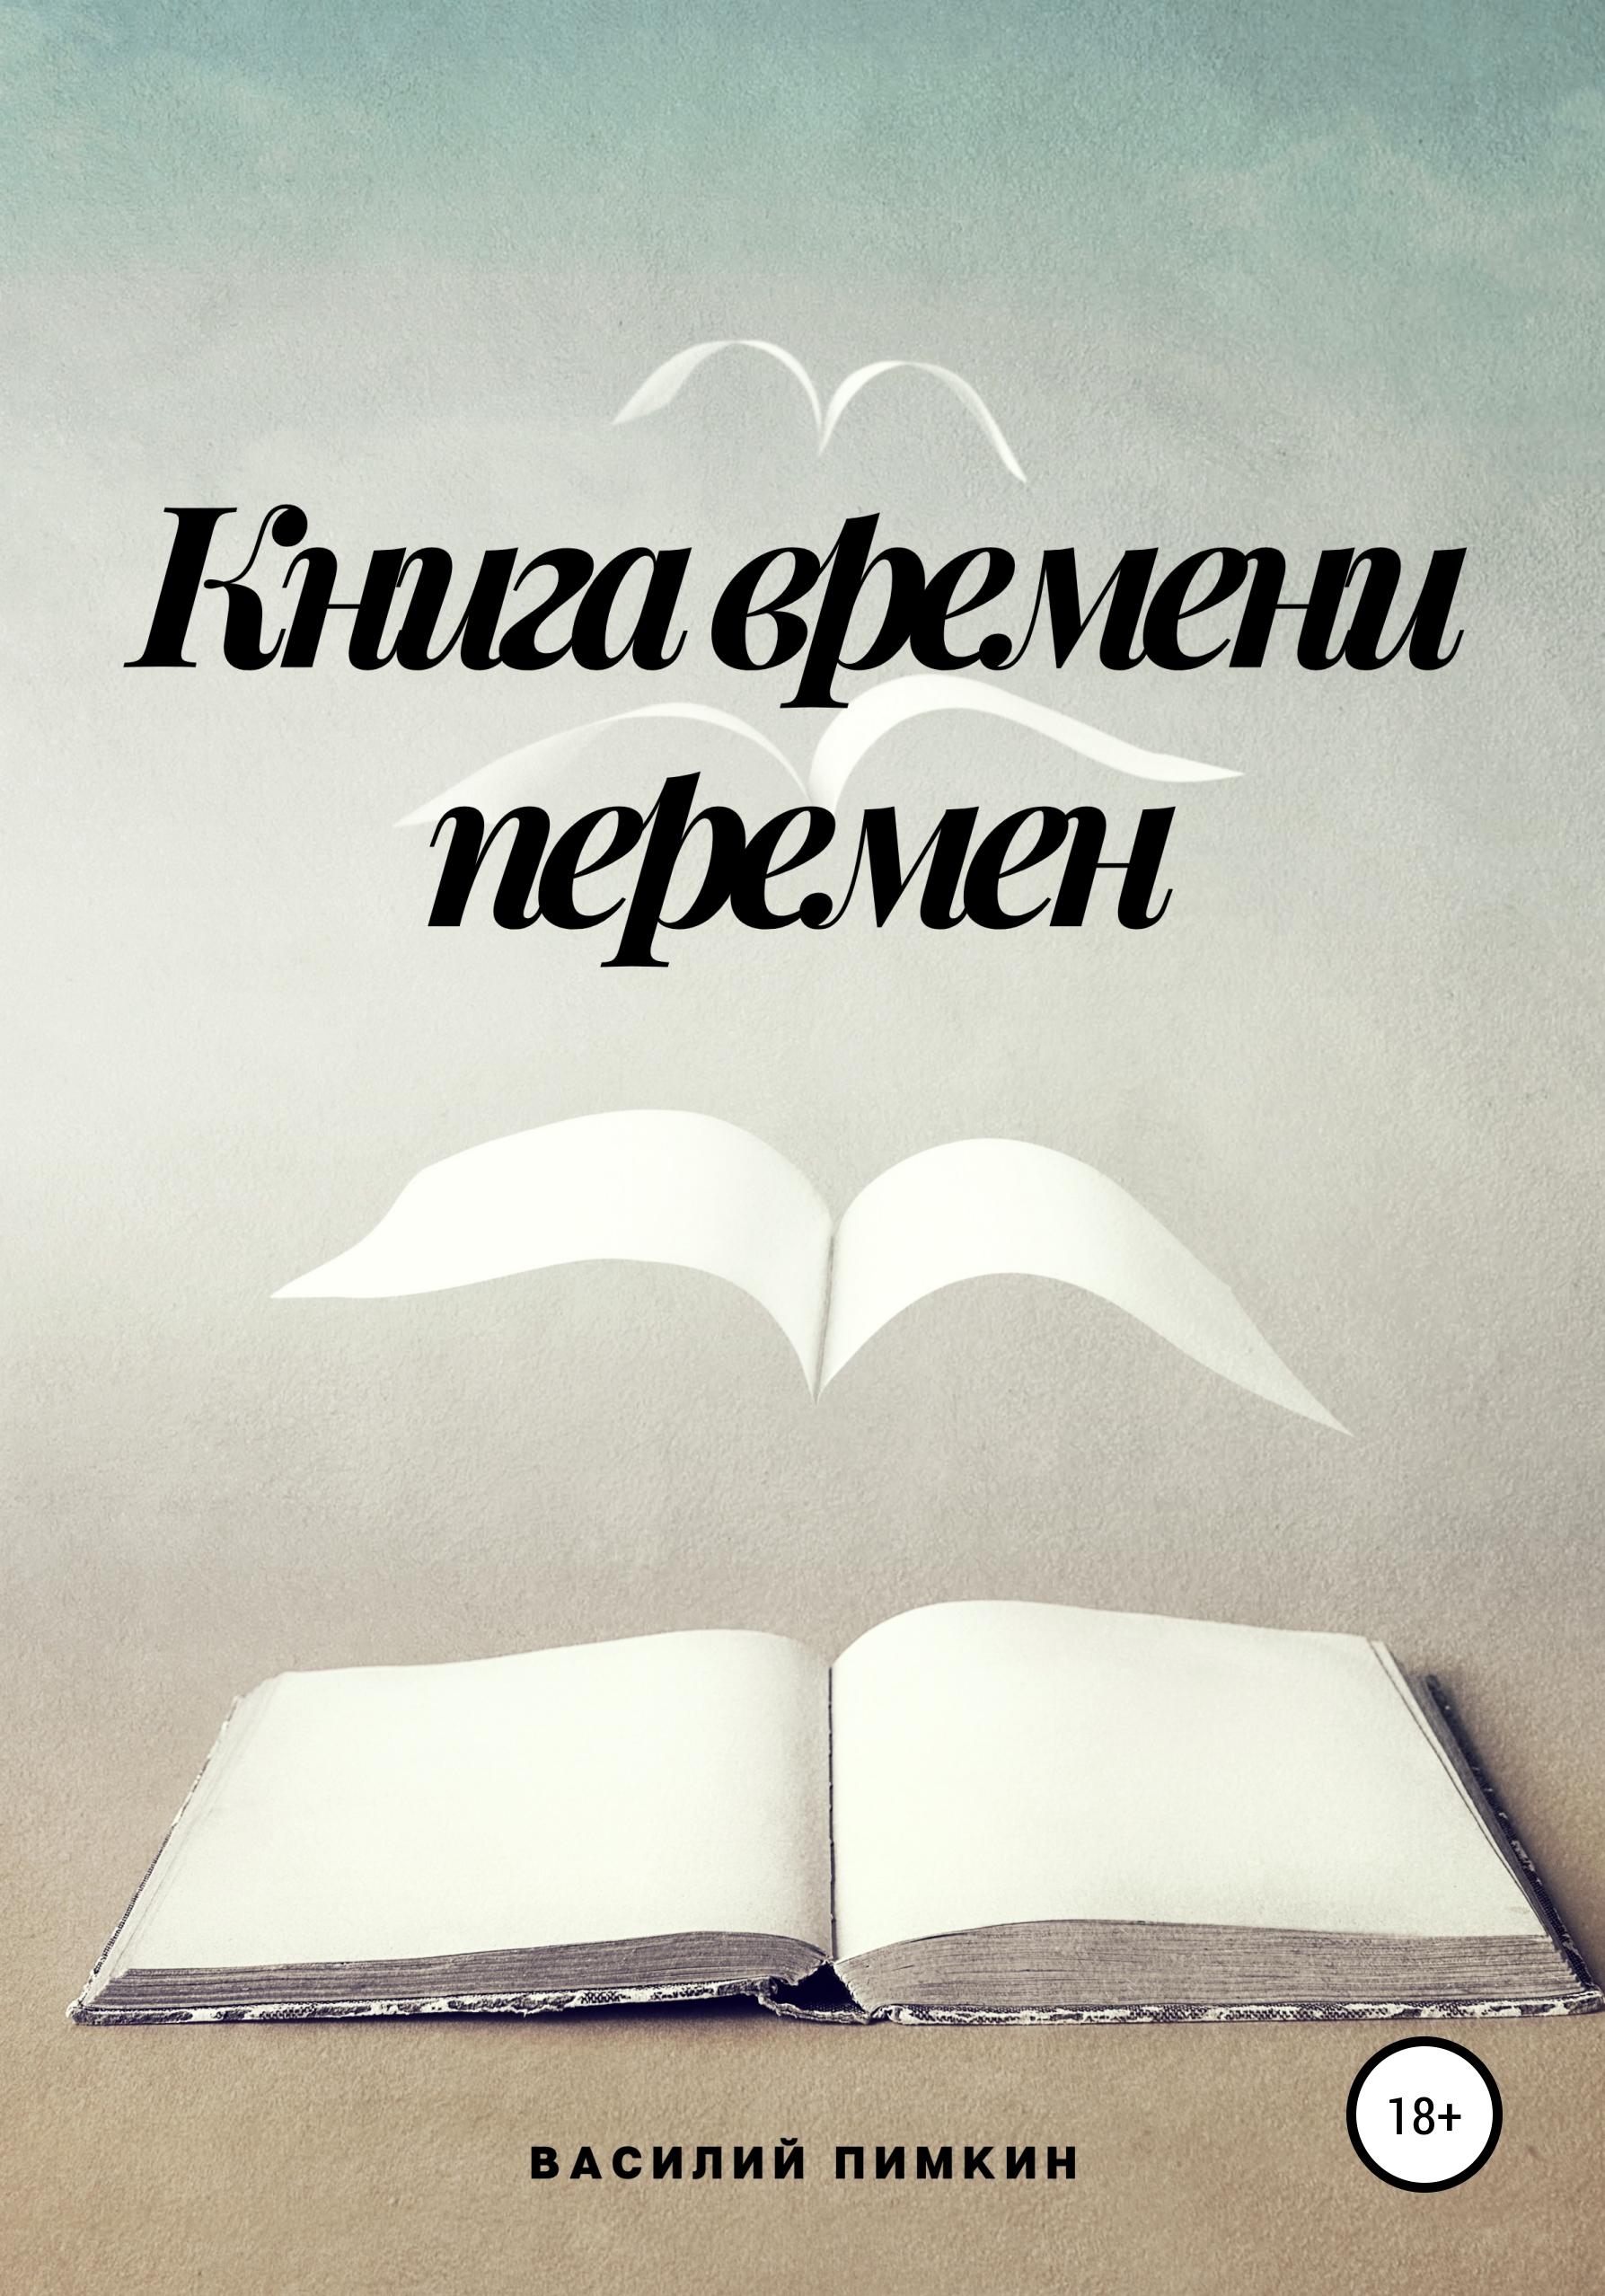 Книга времени перемен